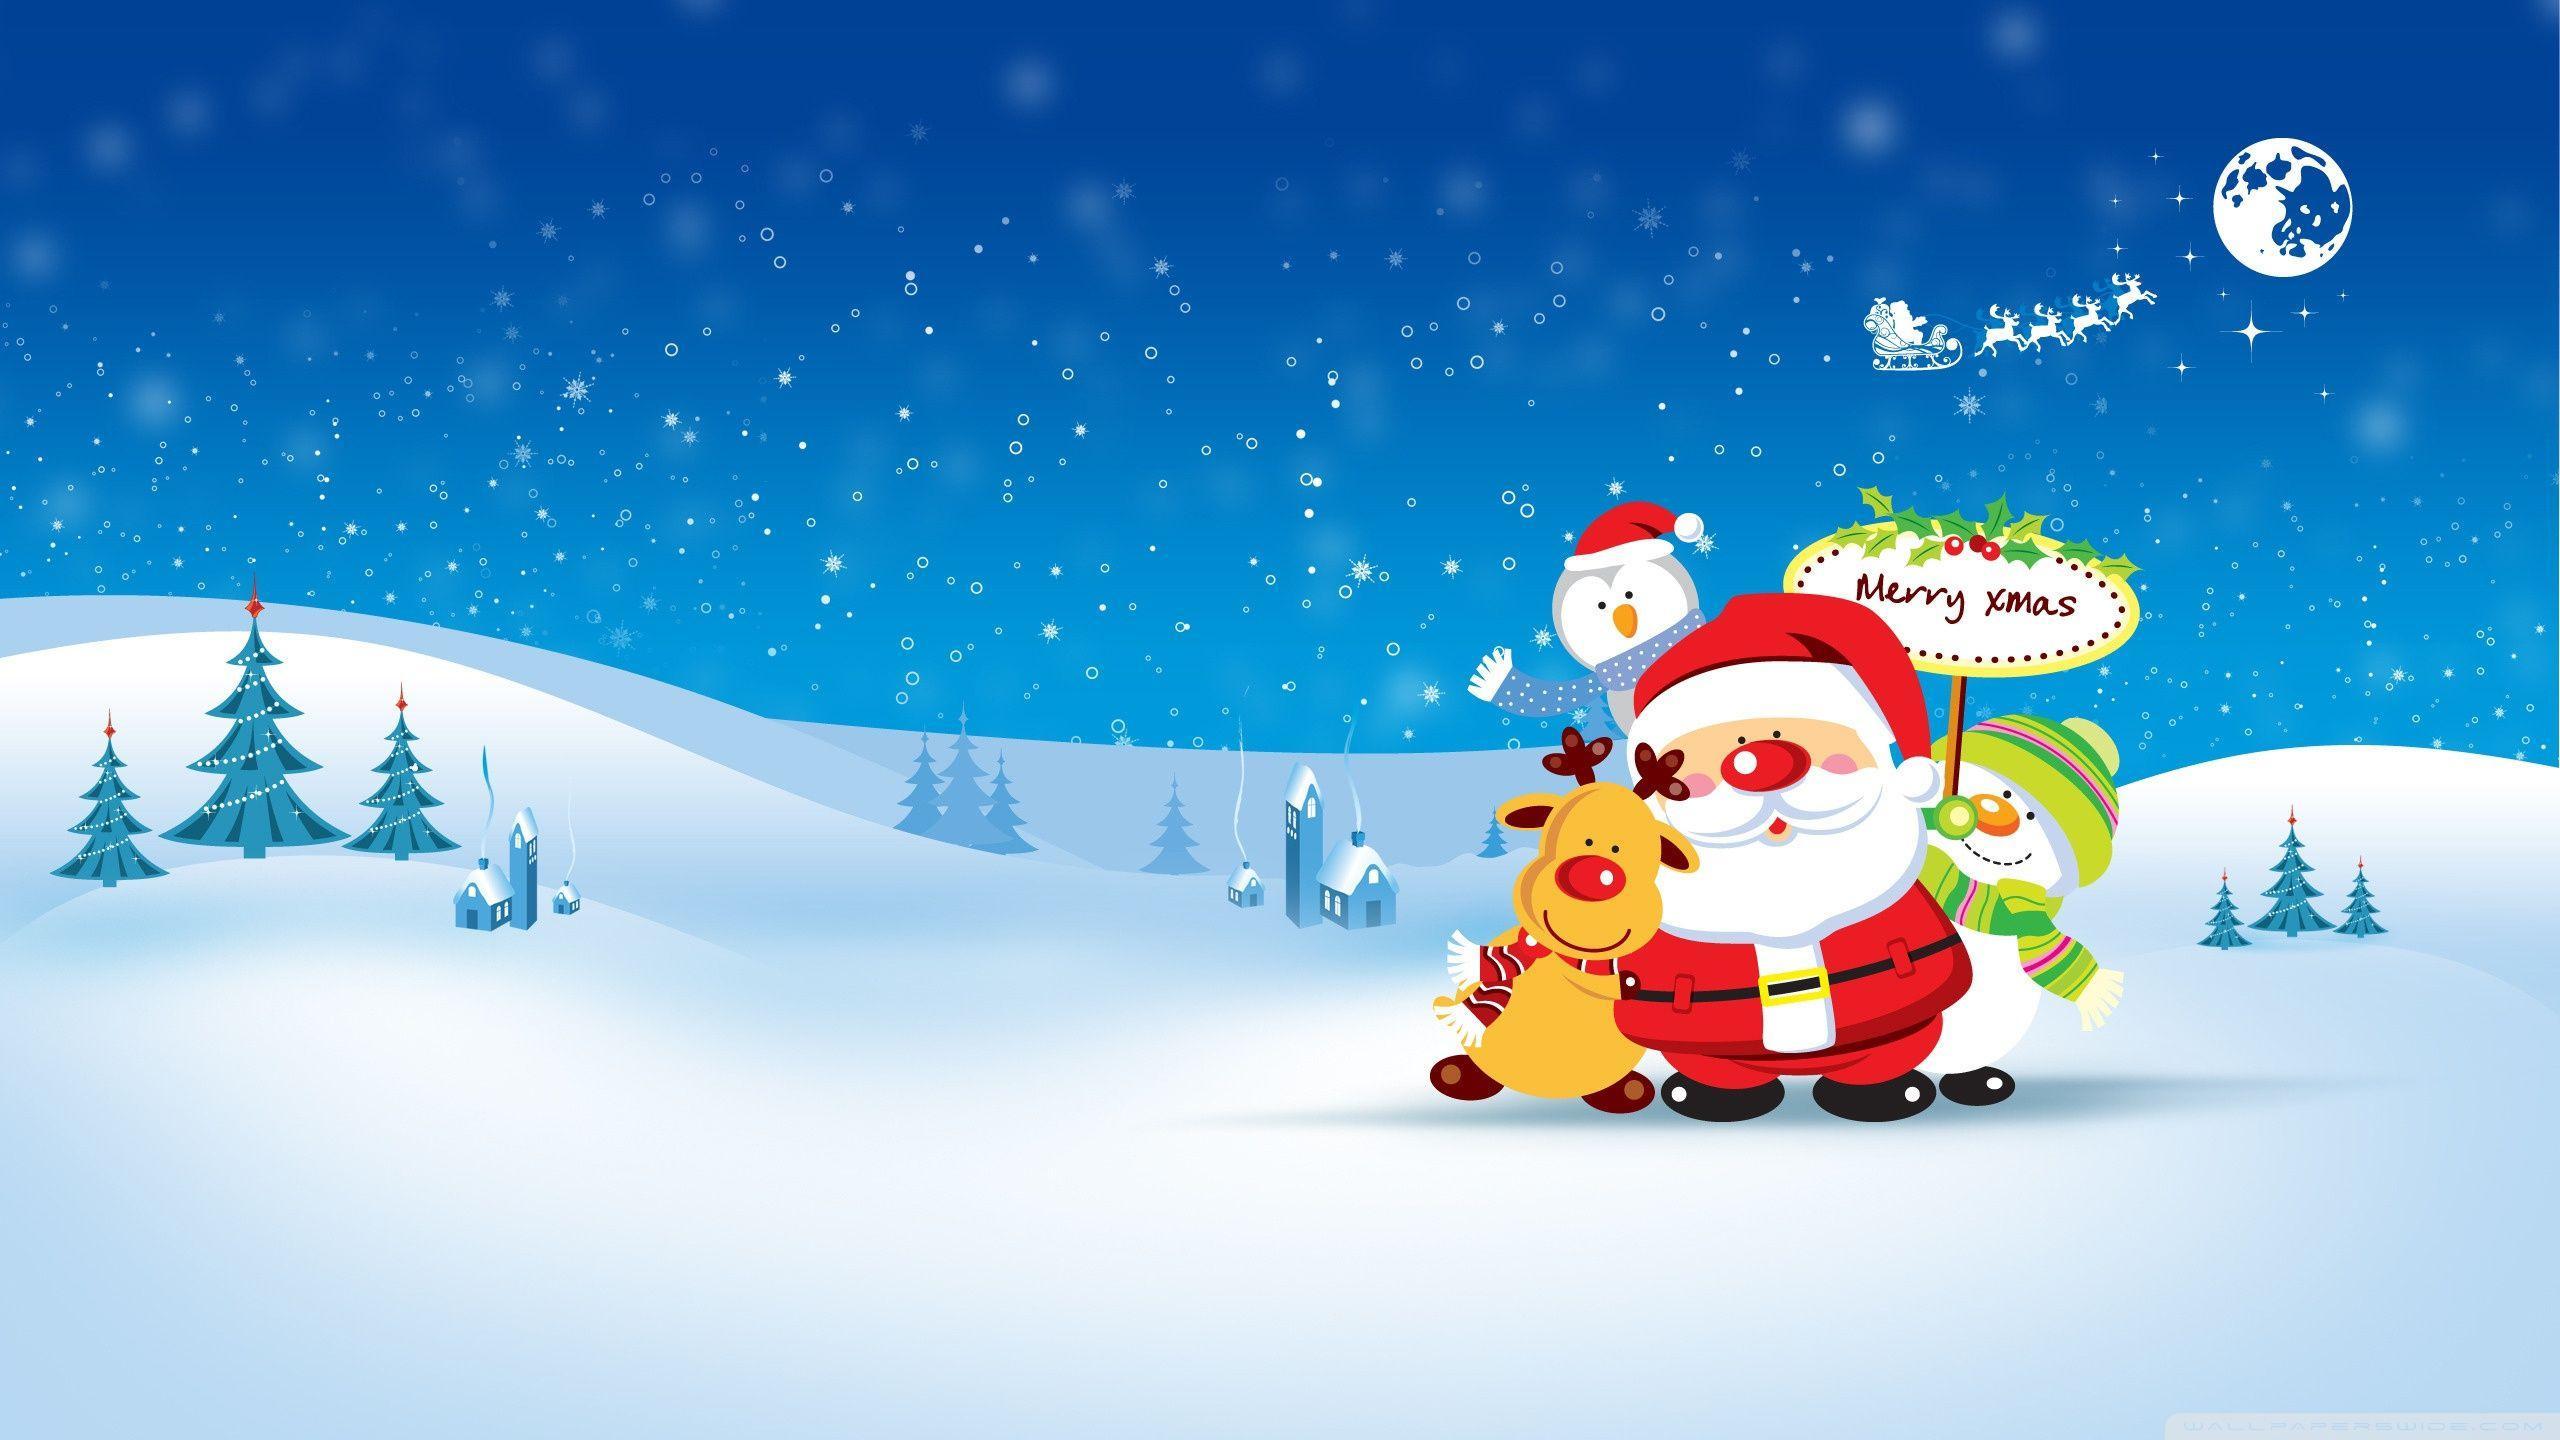 High Resolution Christmas Desktop Wallpapers Top Free High